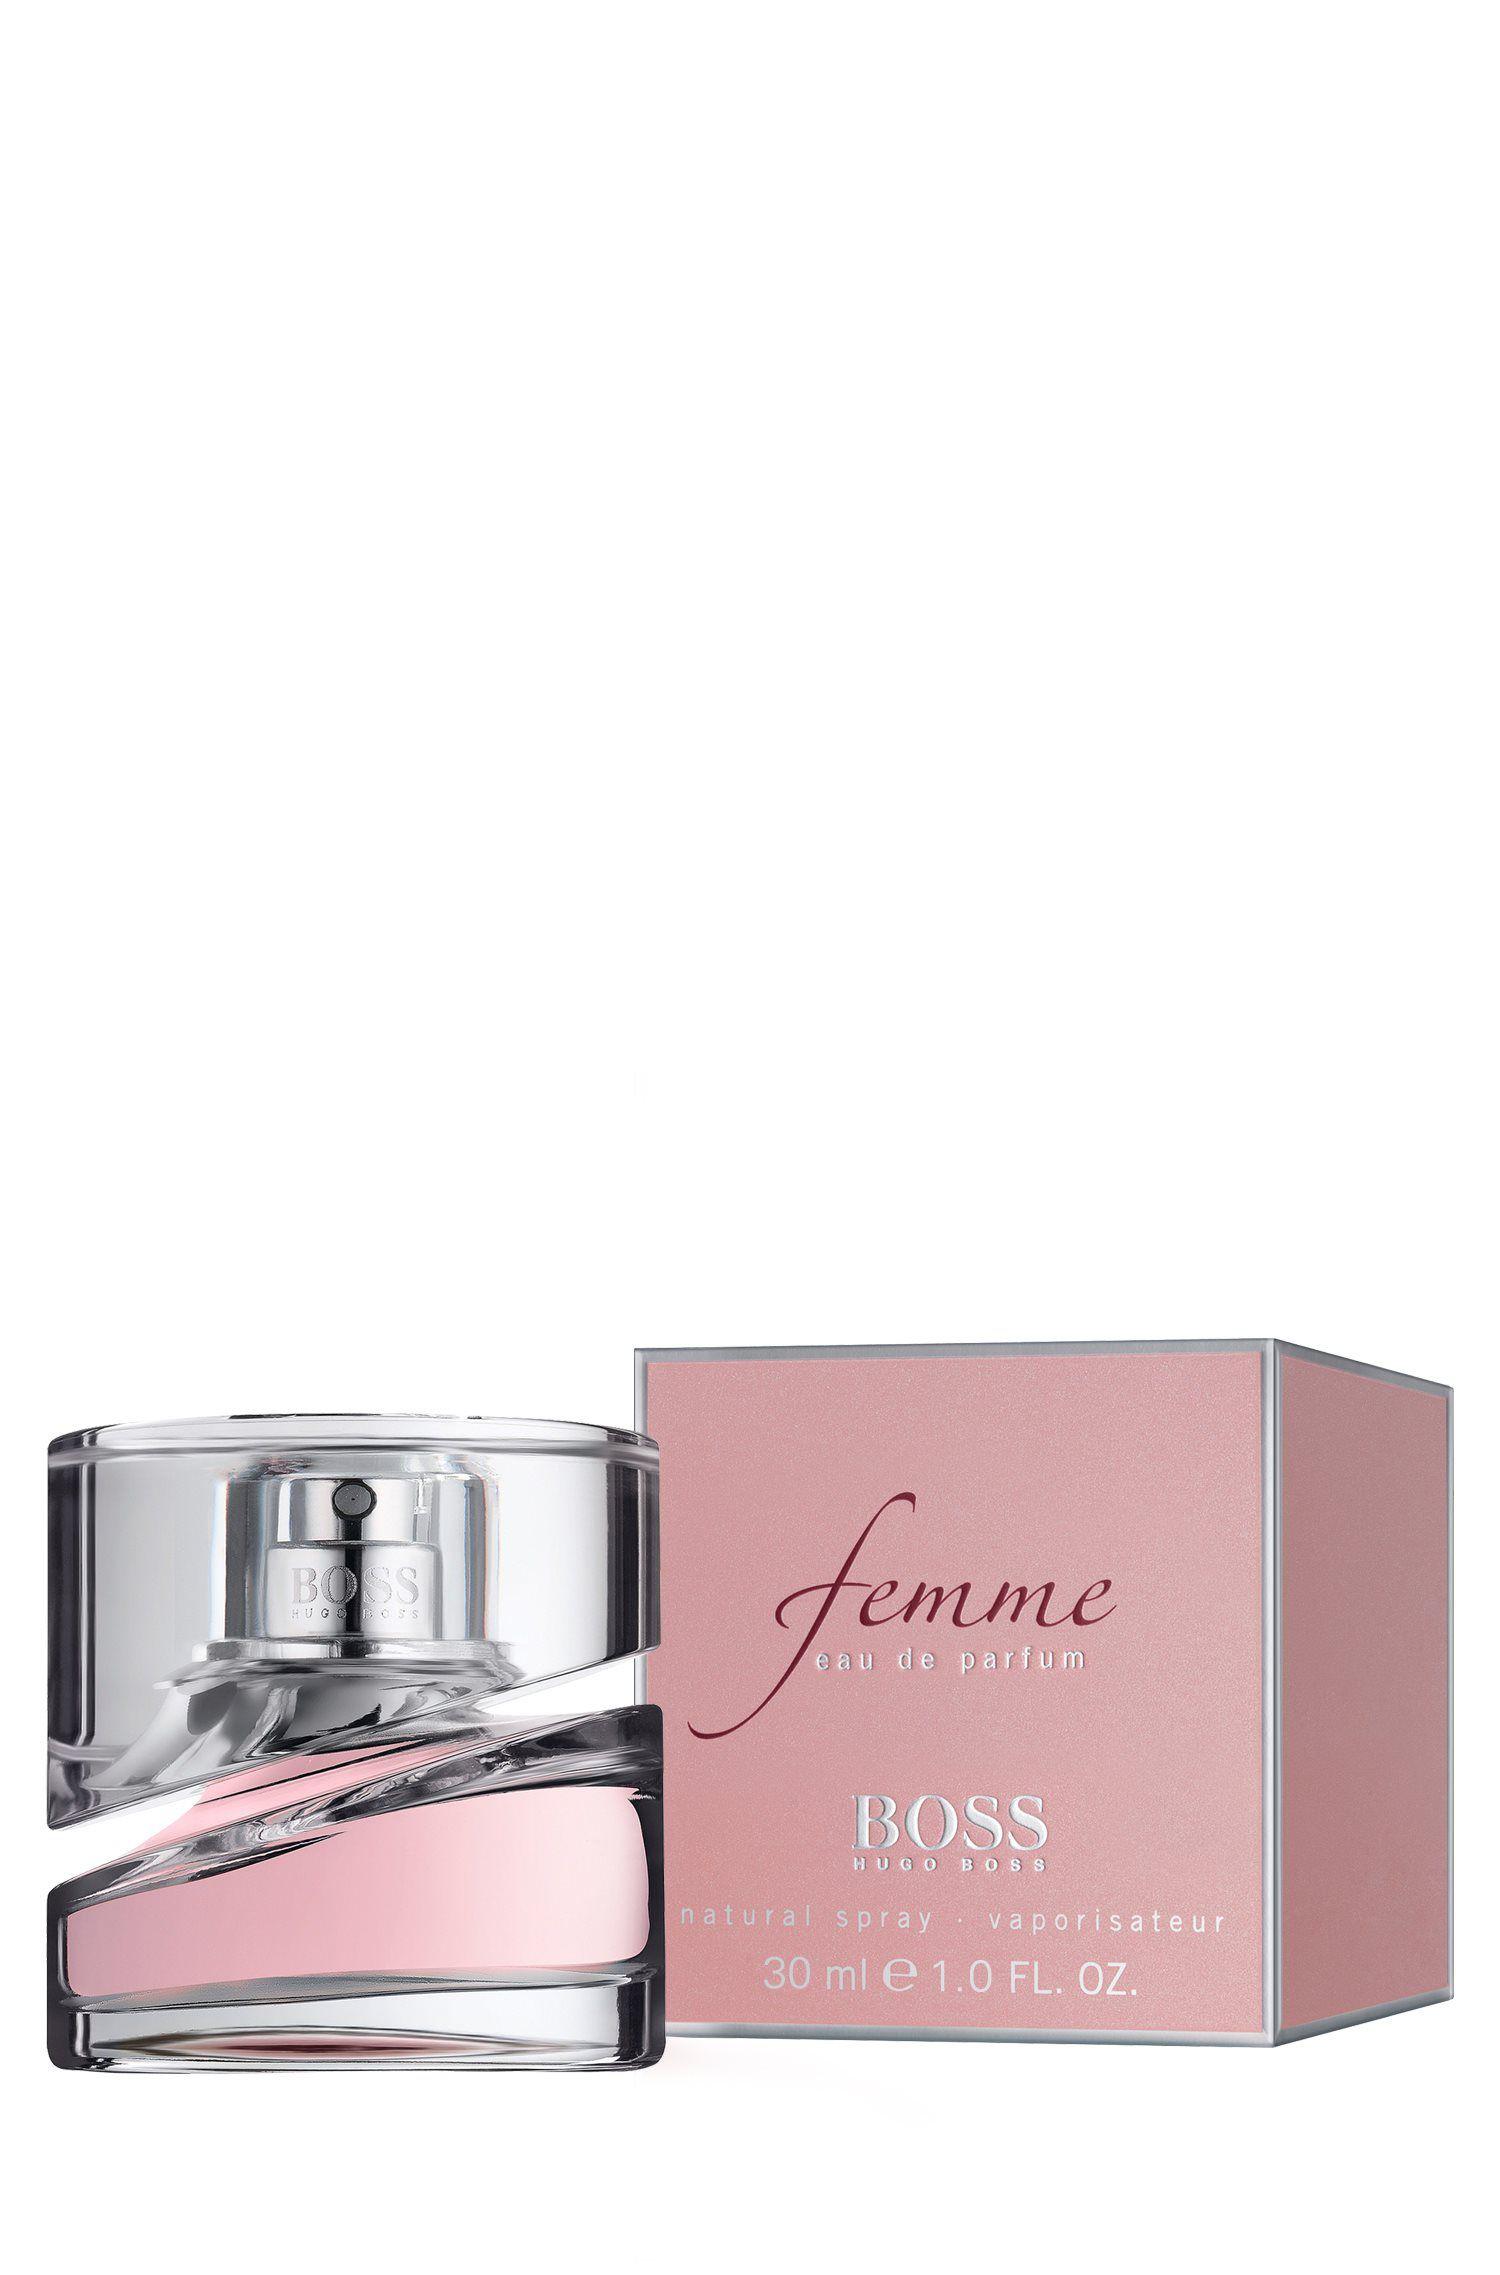 Femme by BOSS eau de parfum 30ml , Assorted-Pre-Pack